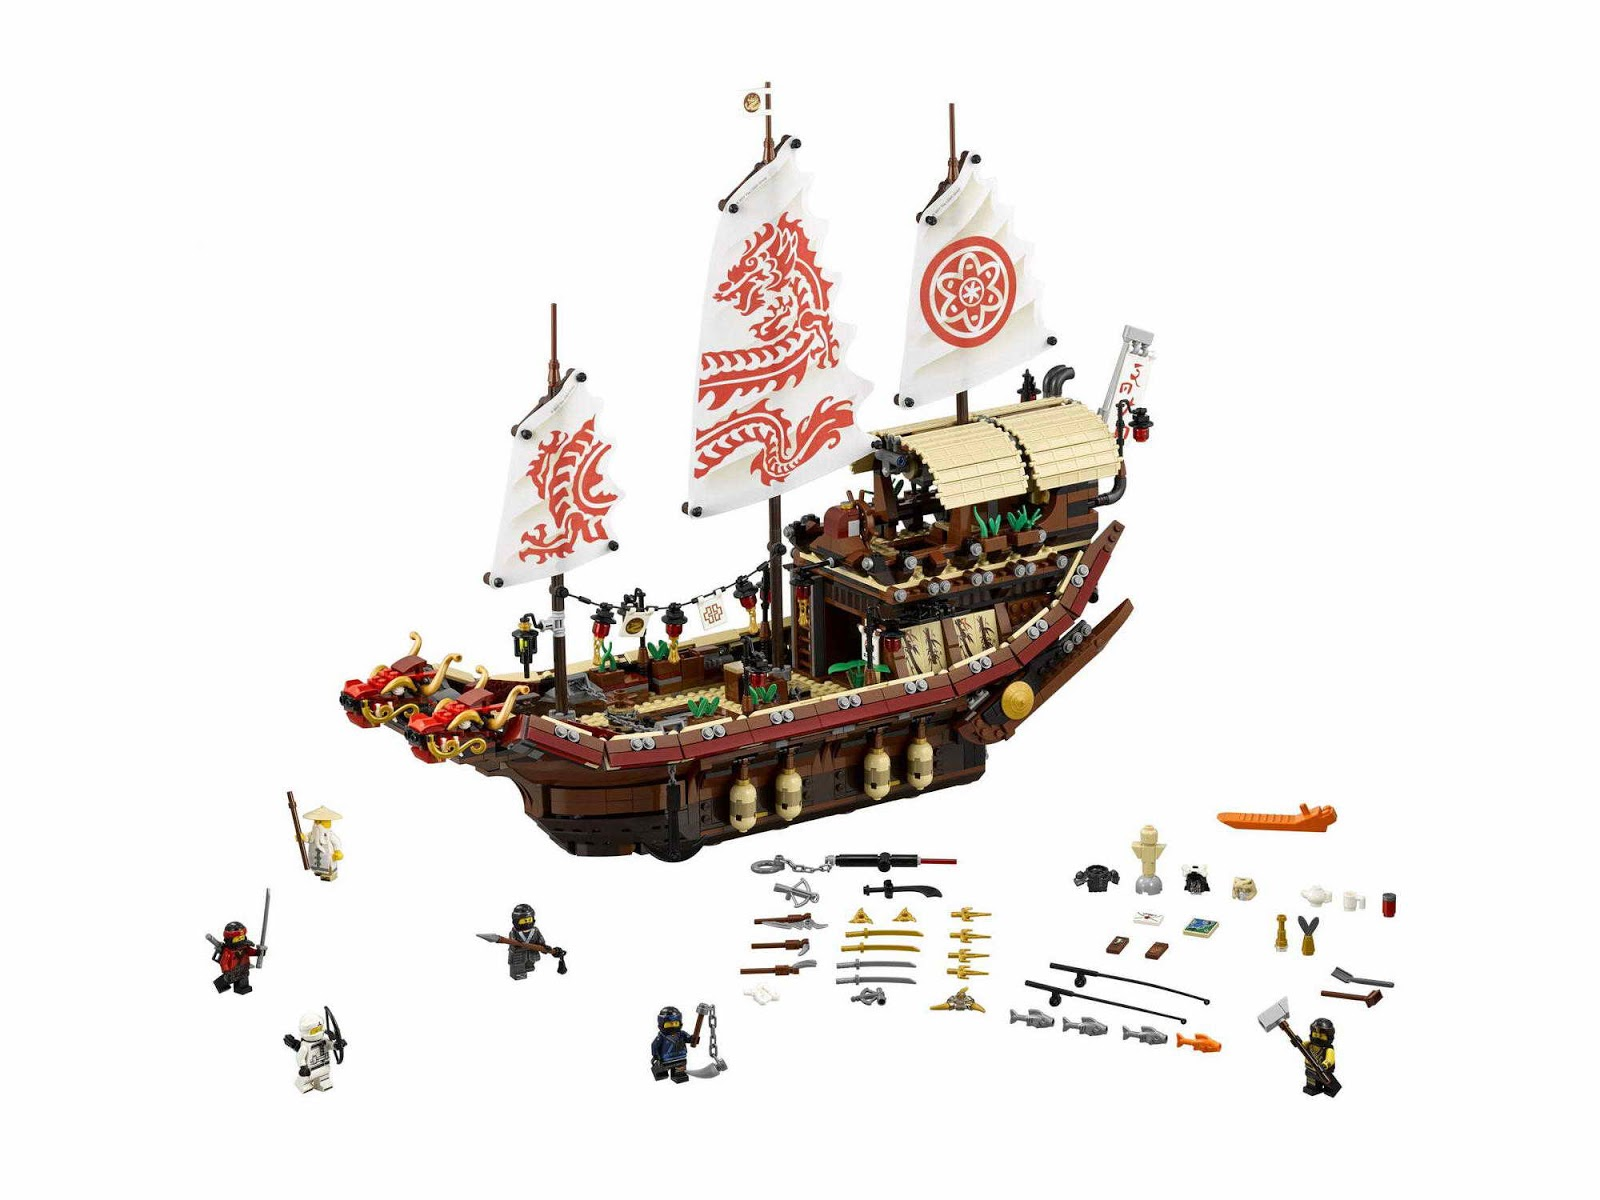 LEGO gosSIP: 170617 LEGO 70618 Destiny's Bounty box art ...